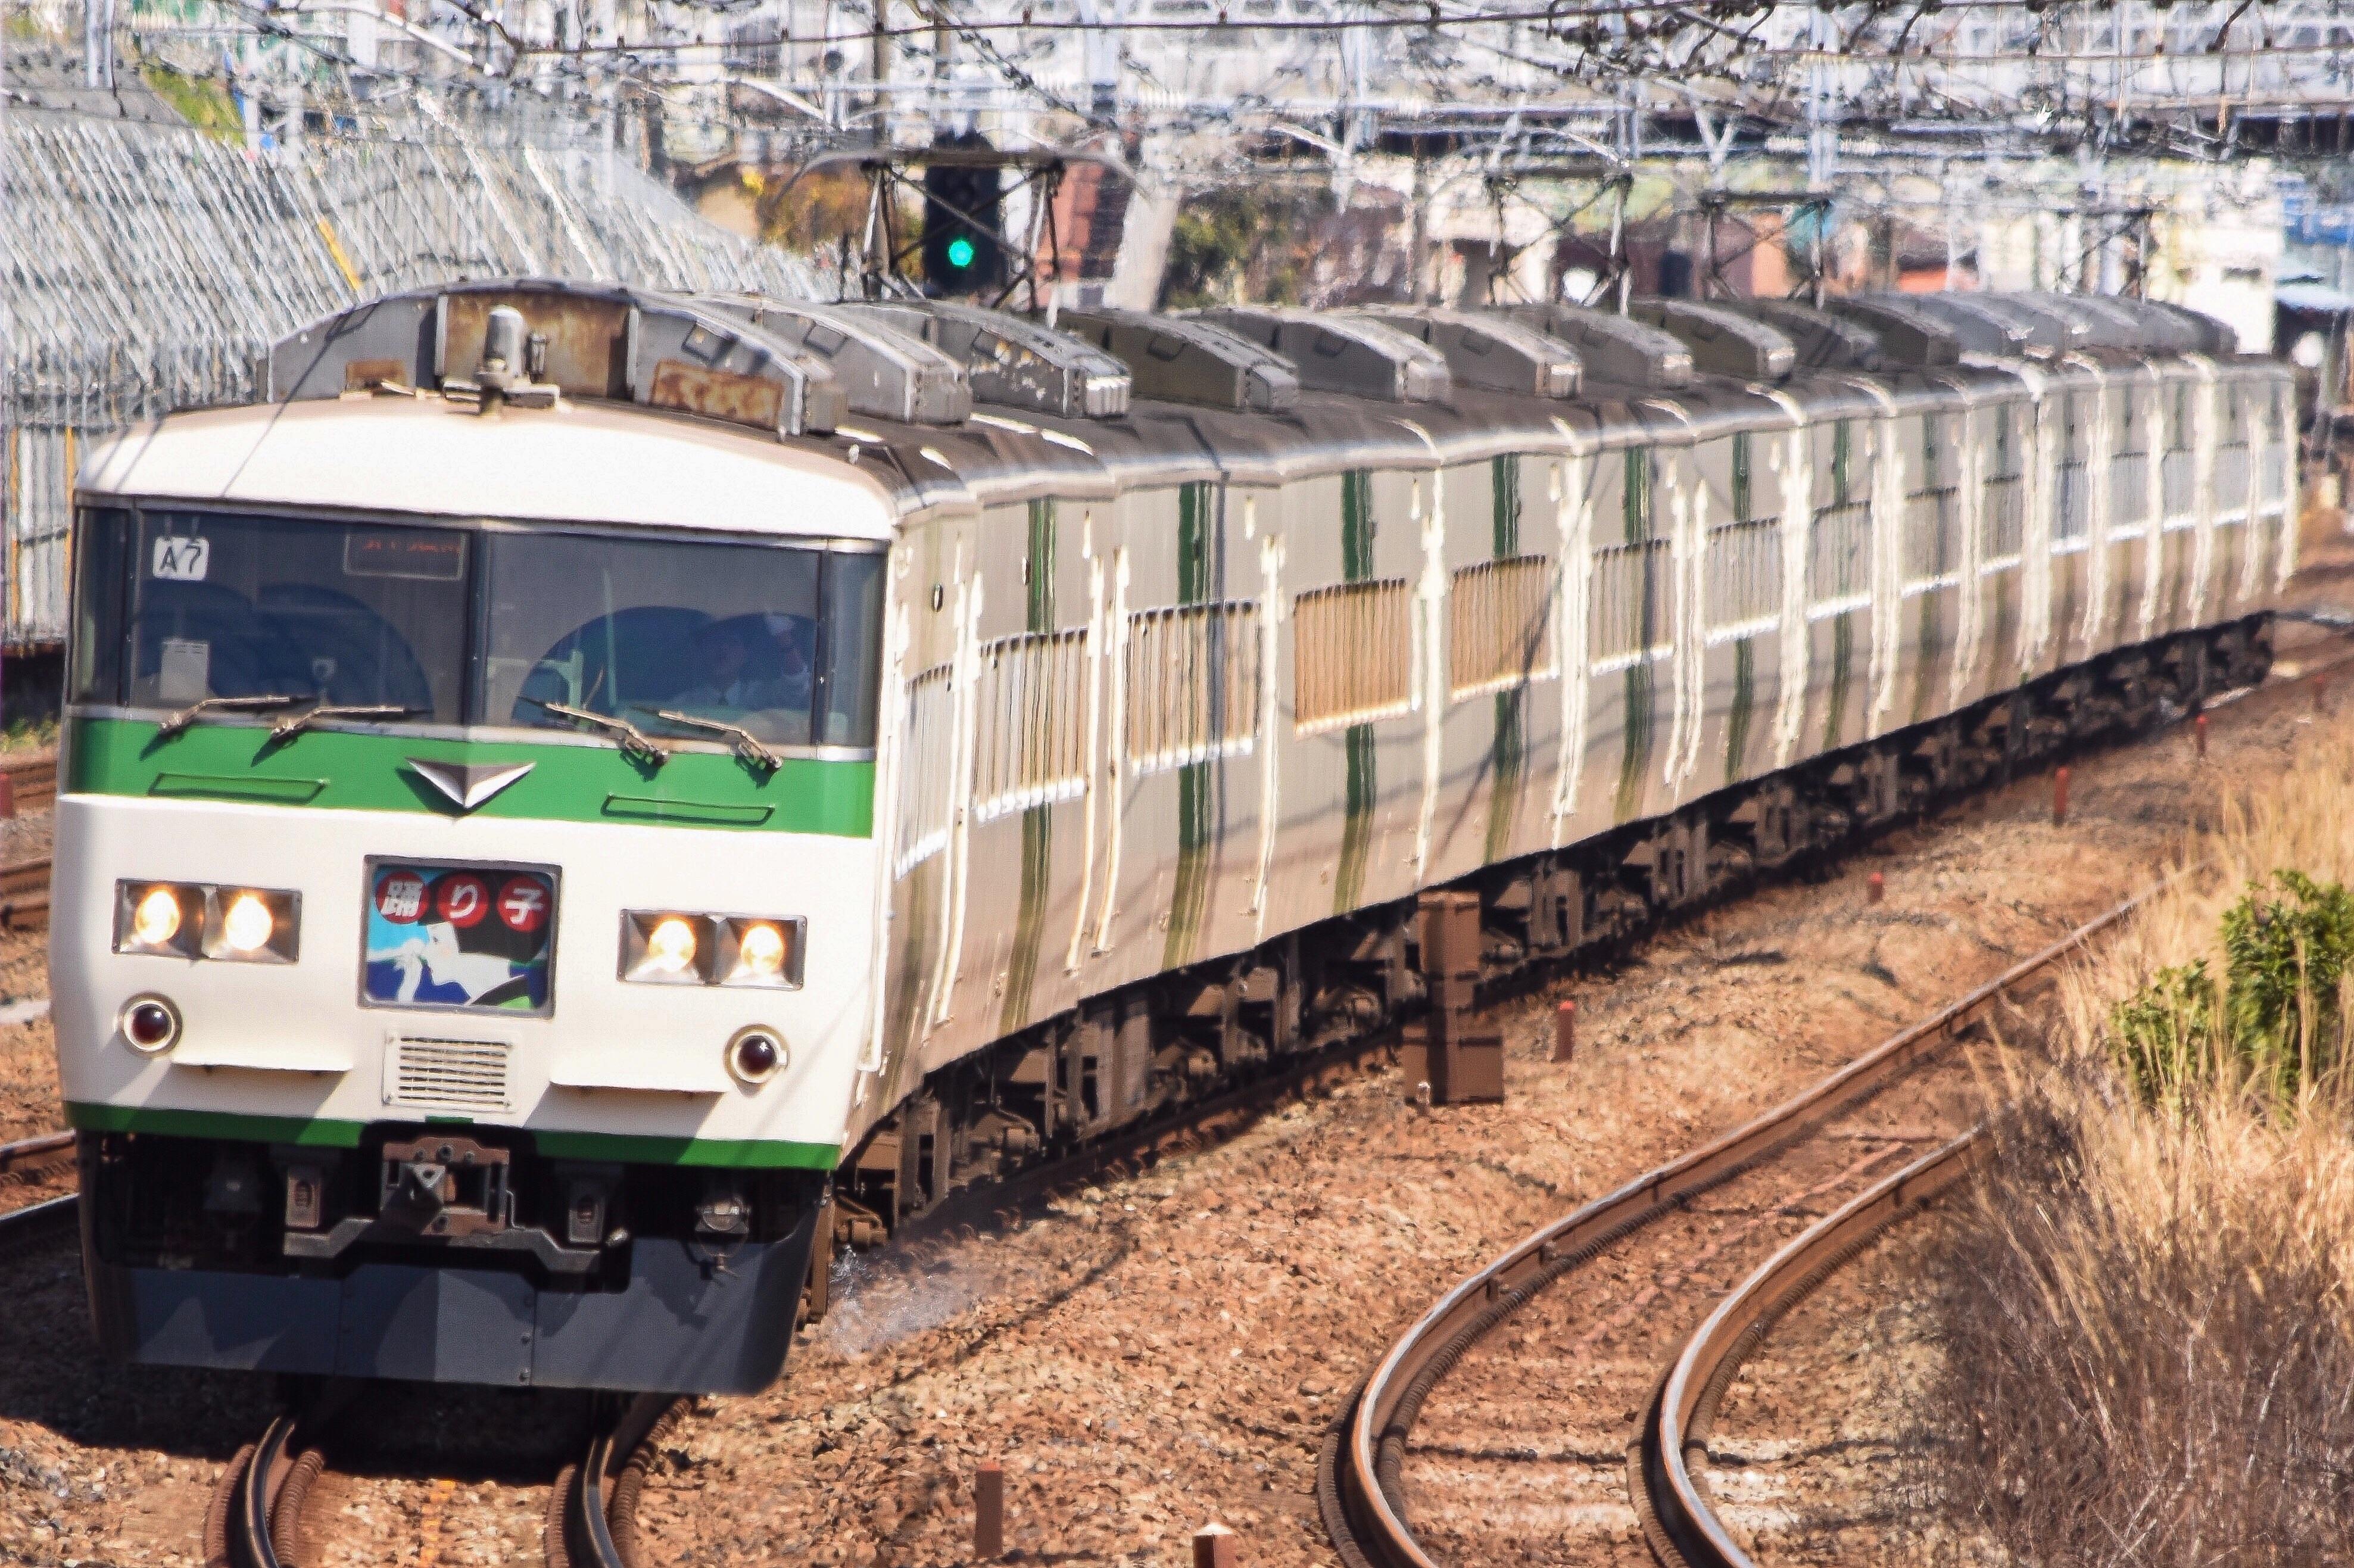 f:id:Nagaoka103:20190311230756j:image